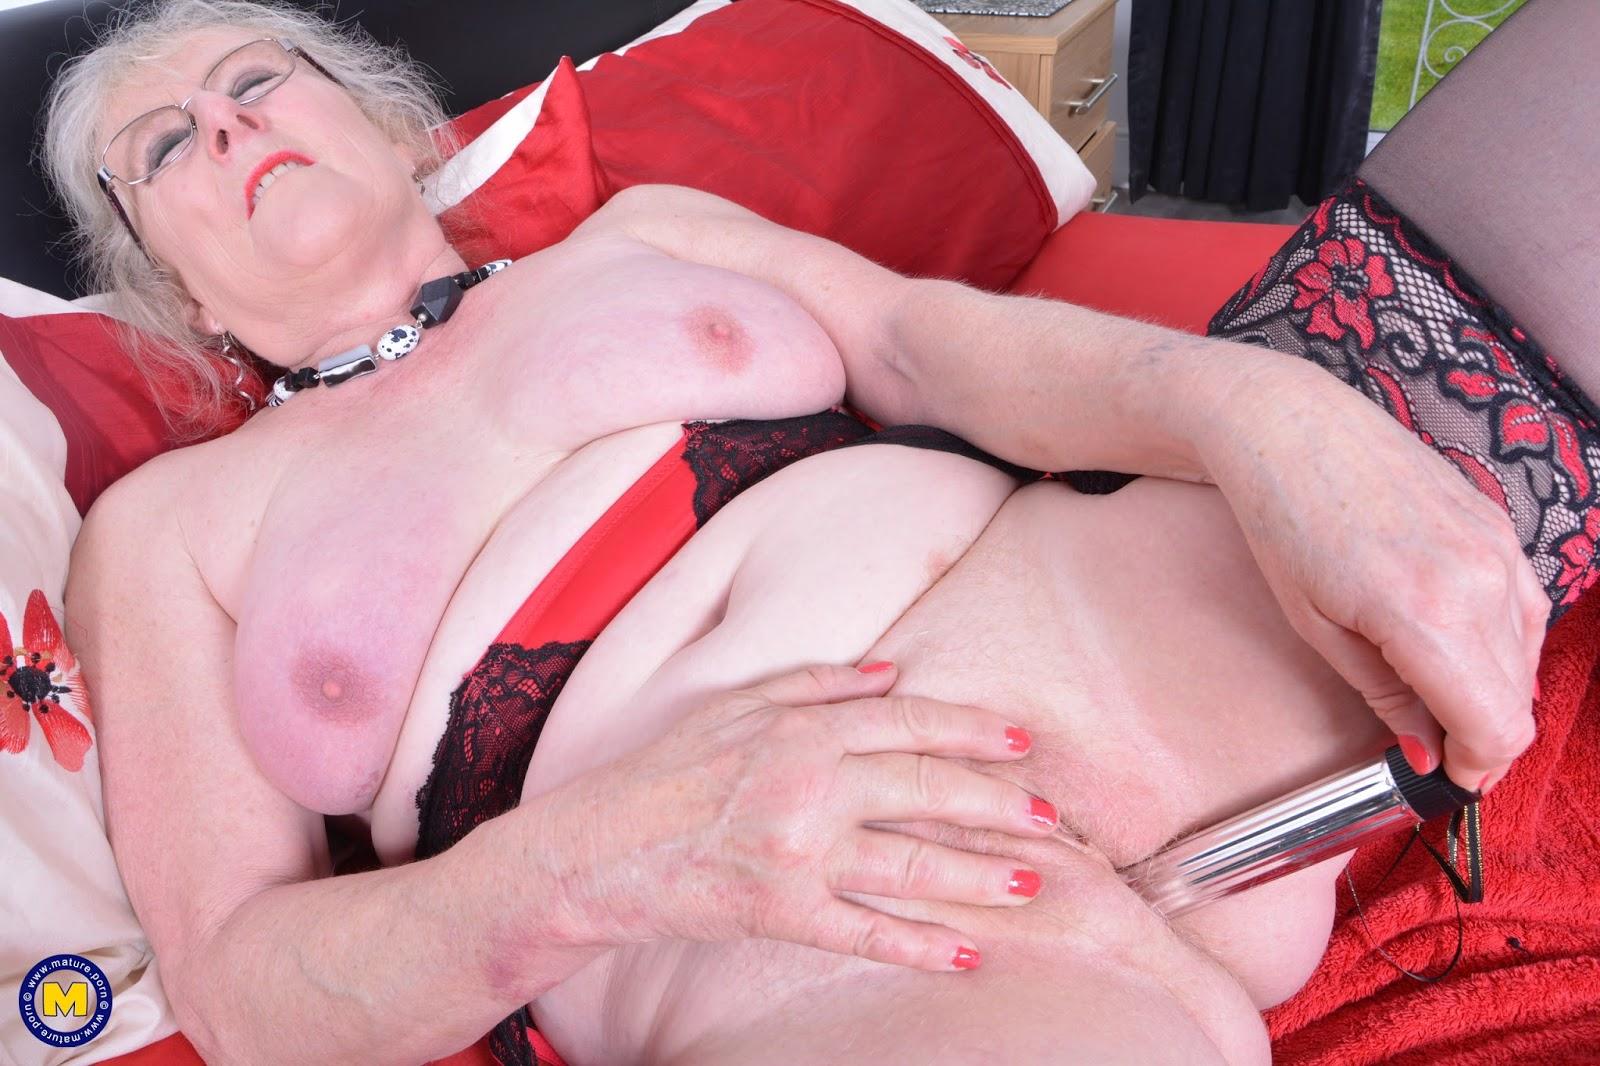 Порно видео старые старушки дрочат — pic 8